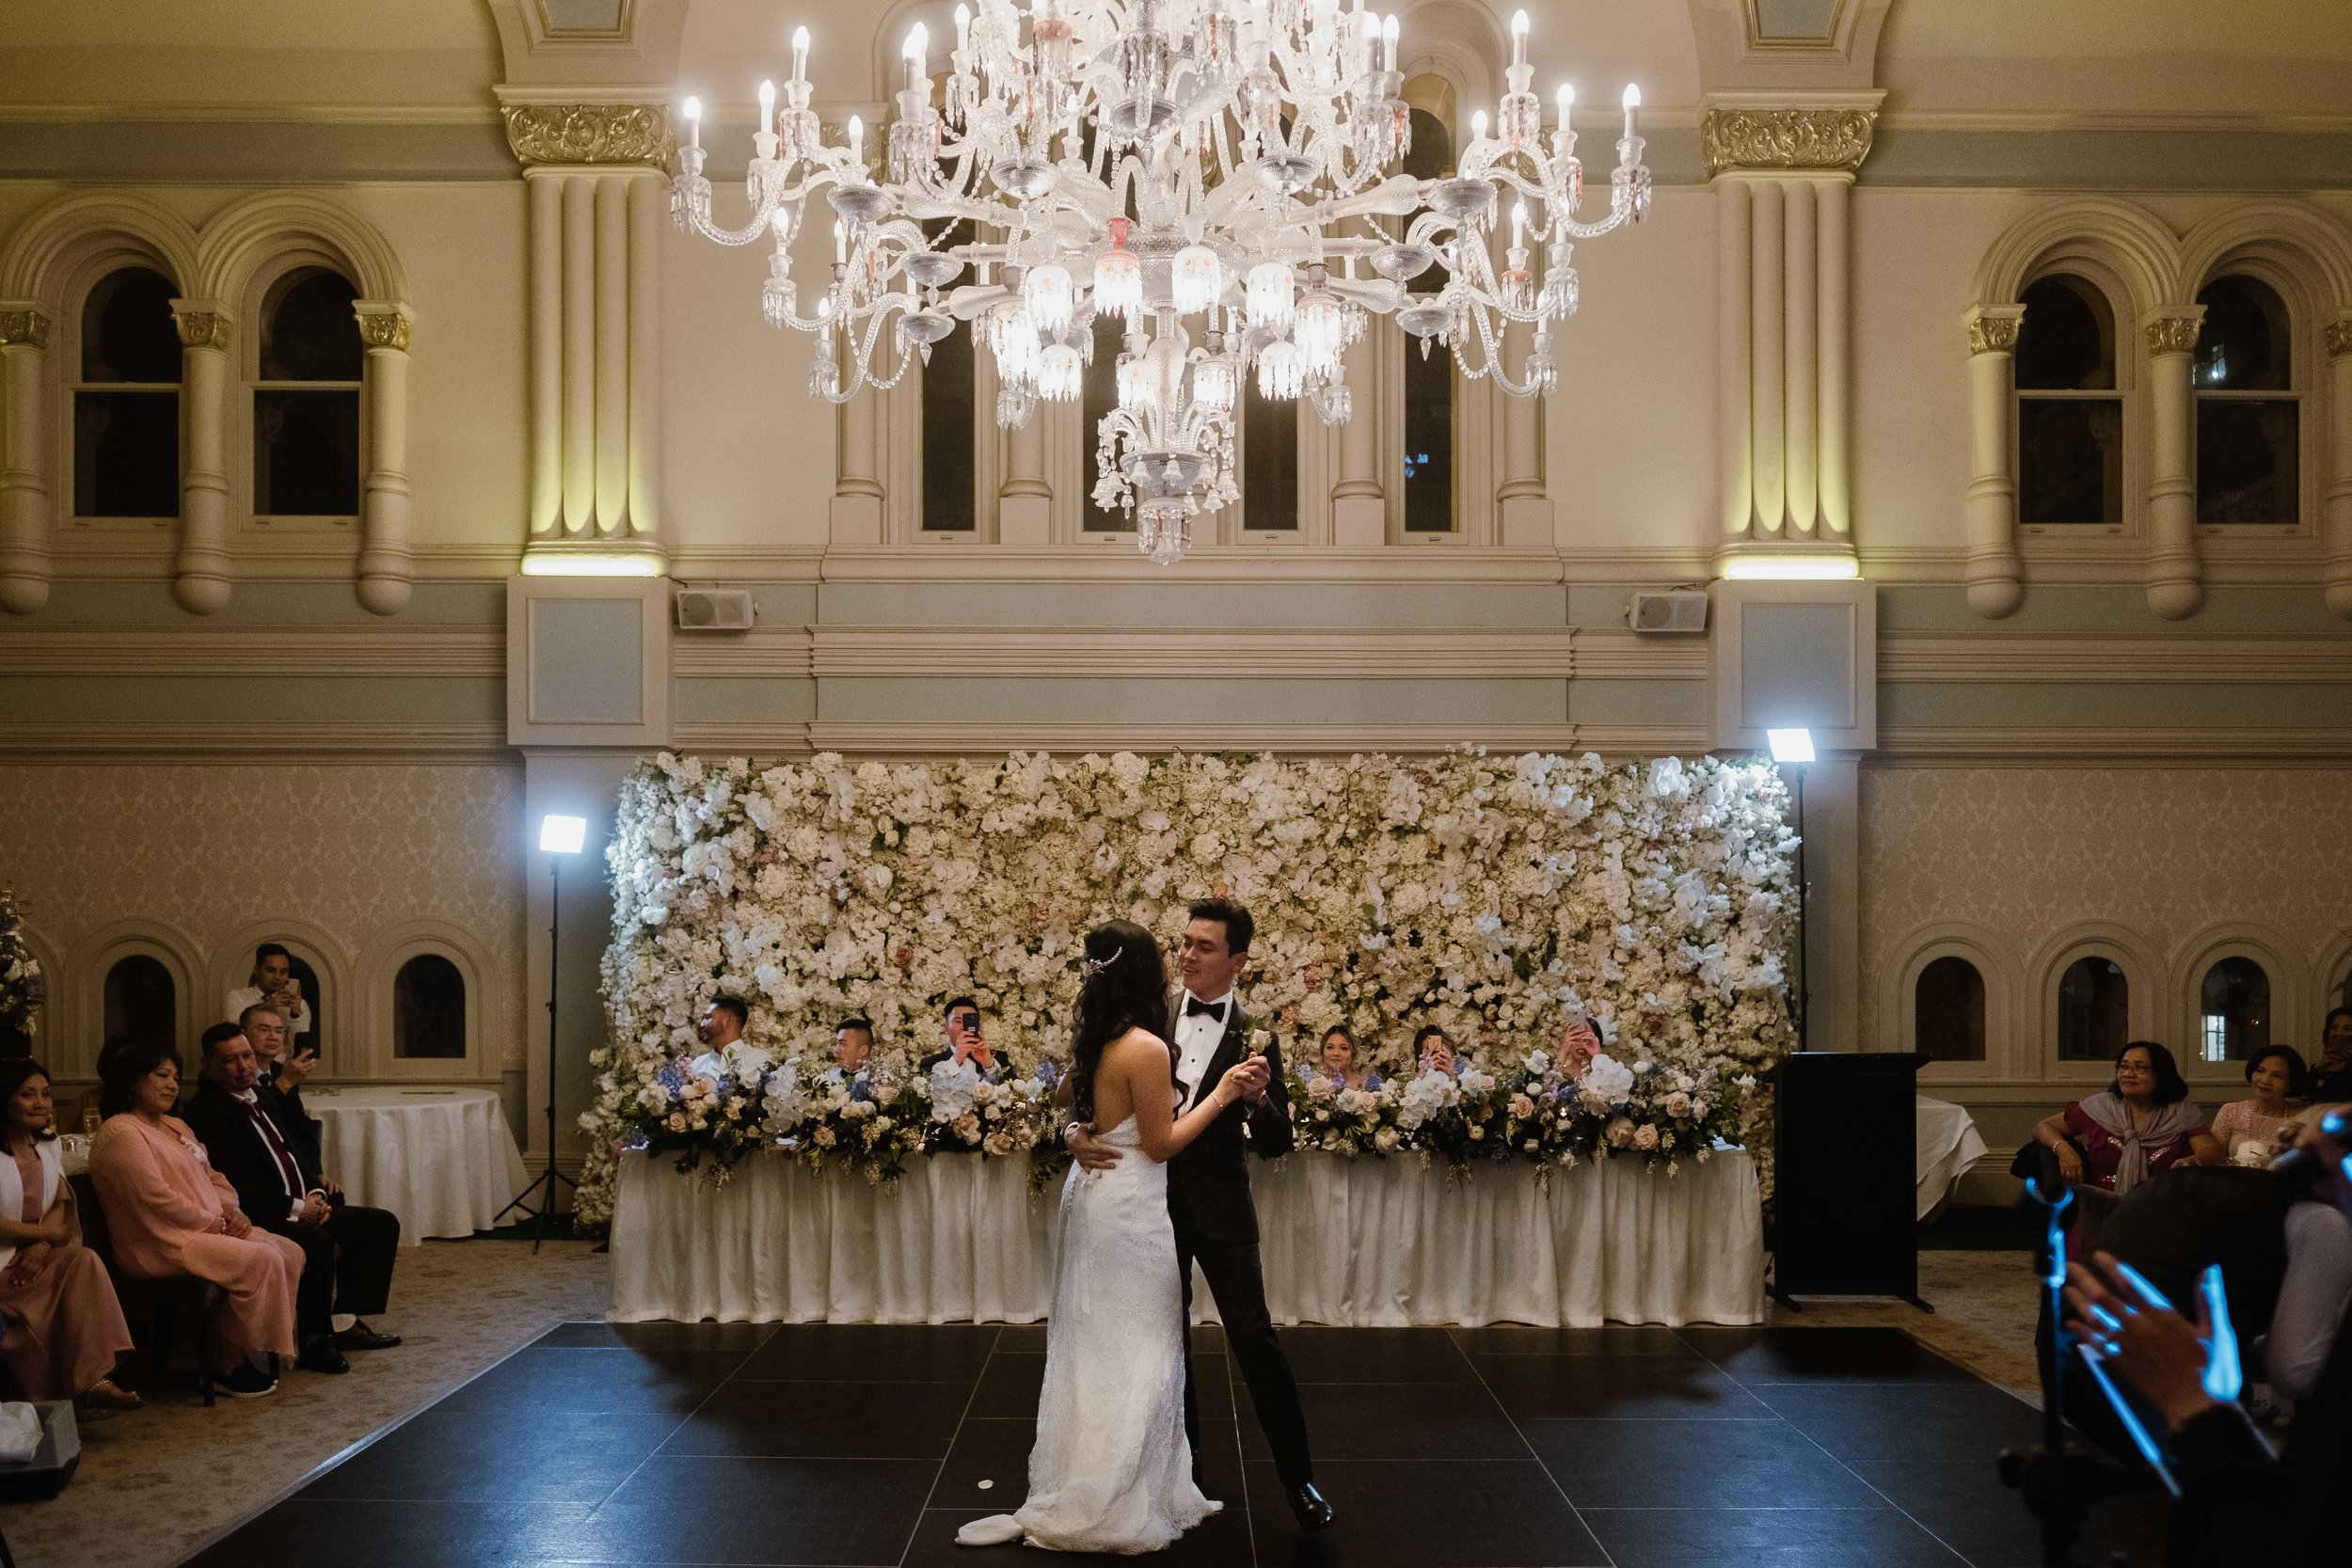 Maria and Gerald Sydney wedding by Milton Gan Photography 36.jpg